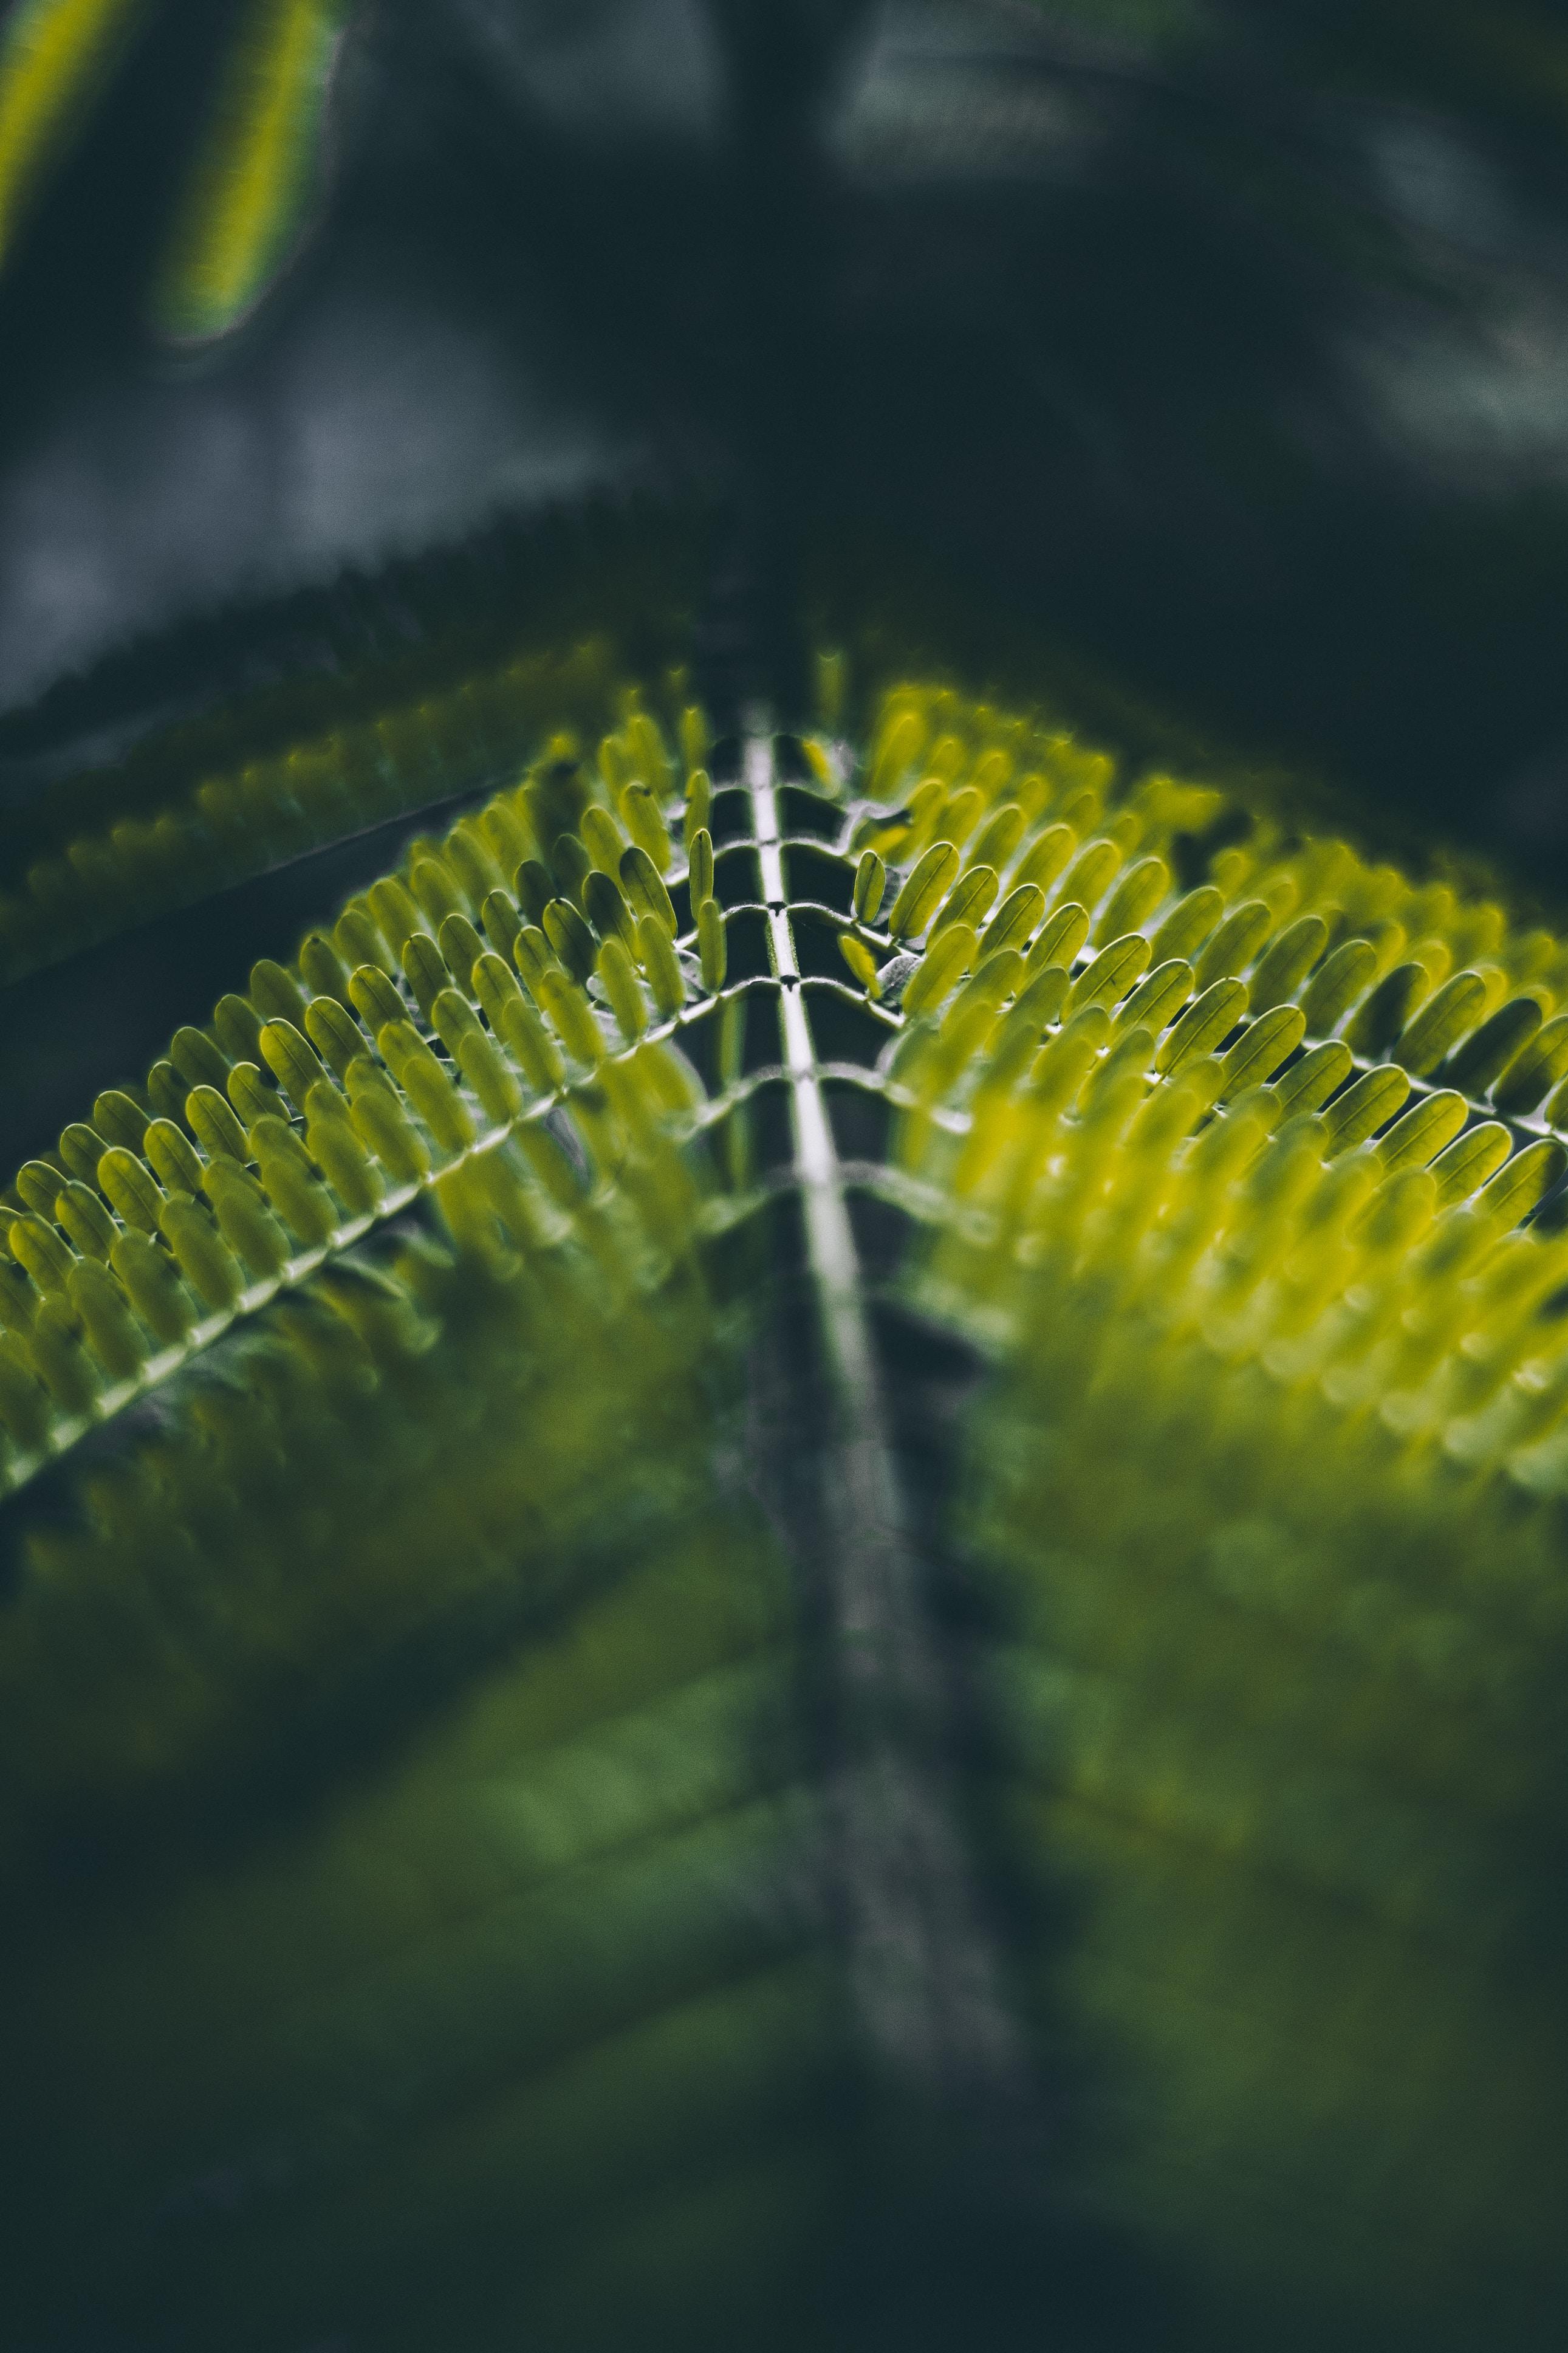 green leaves in closeup shot